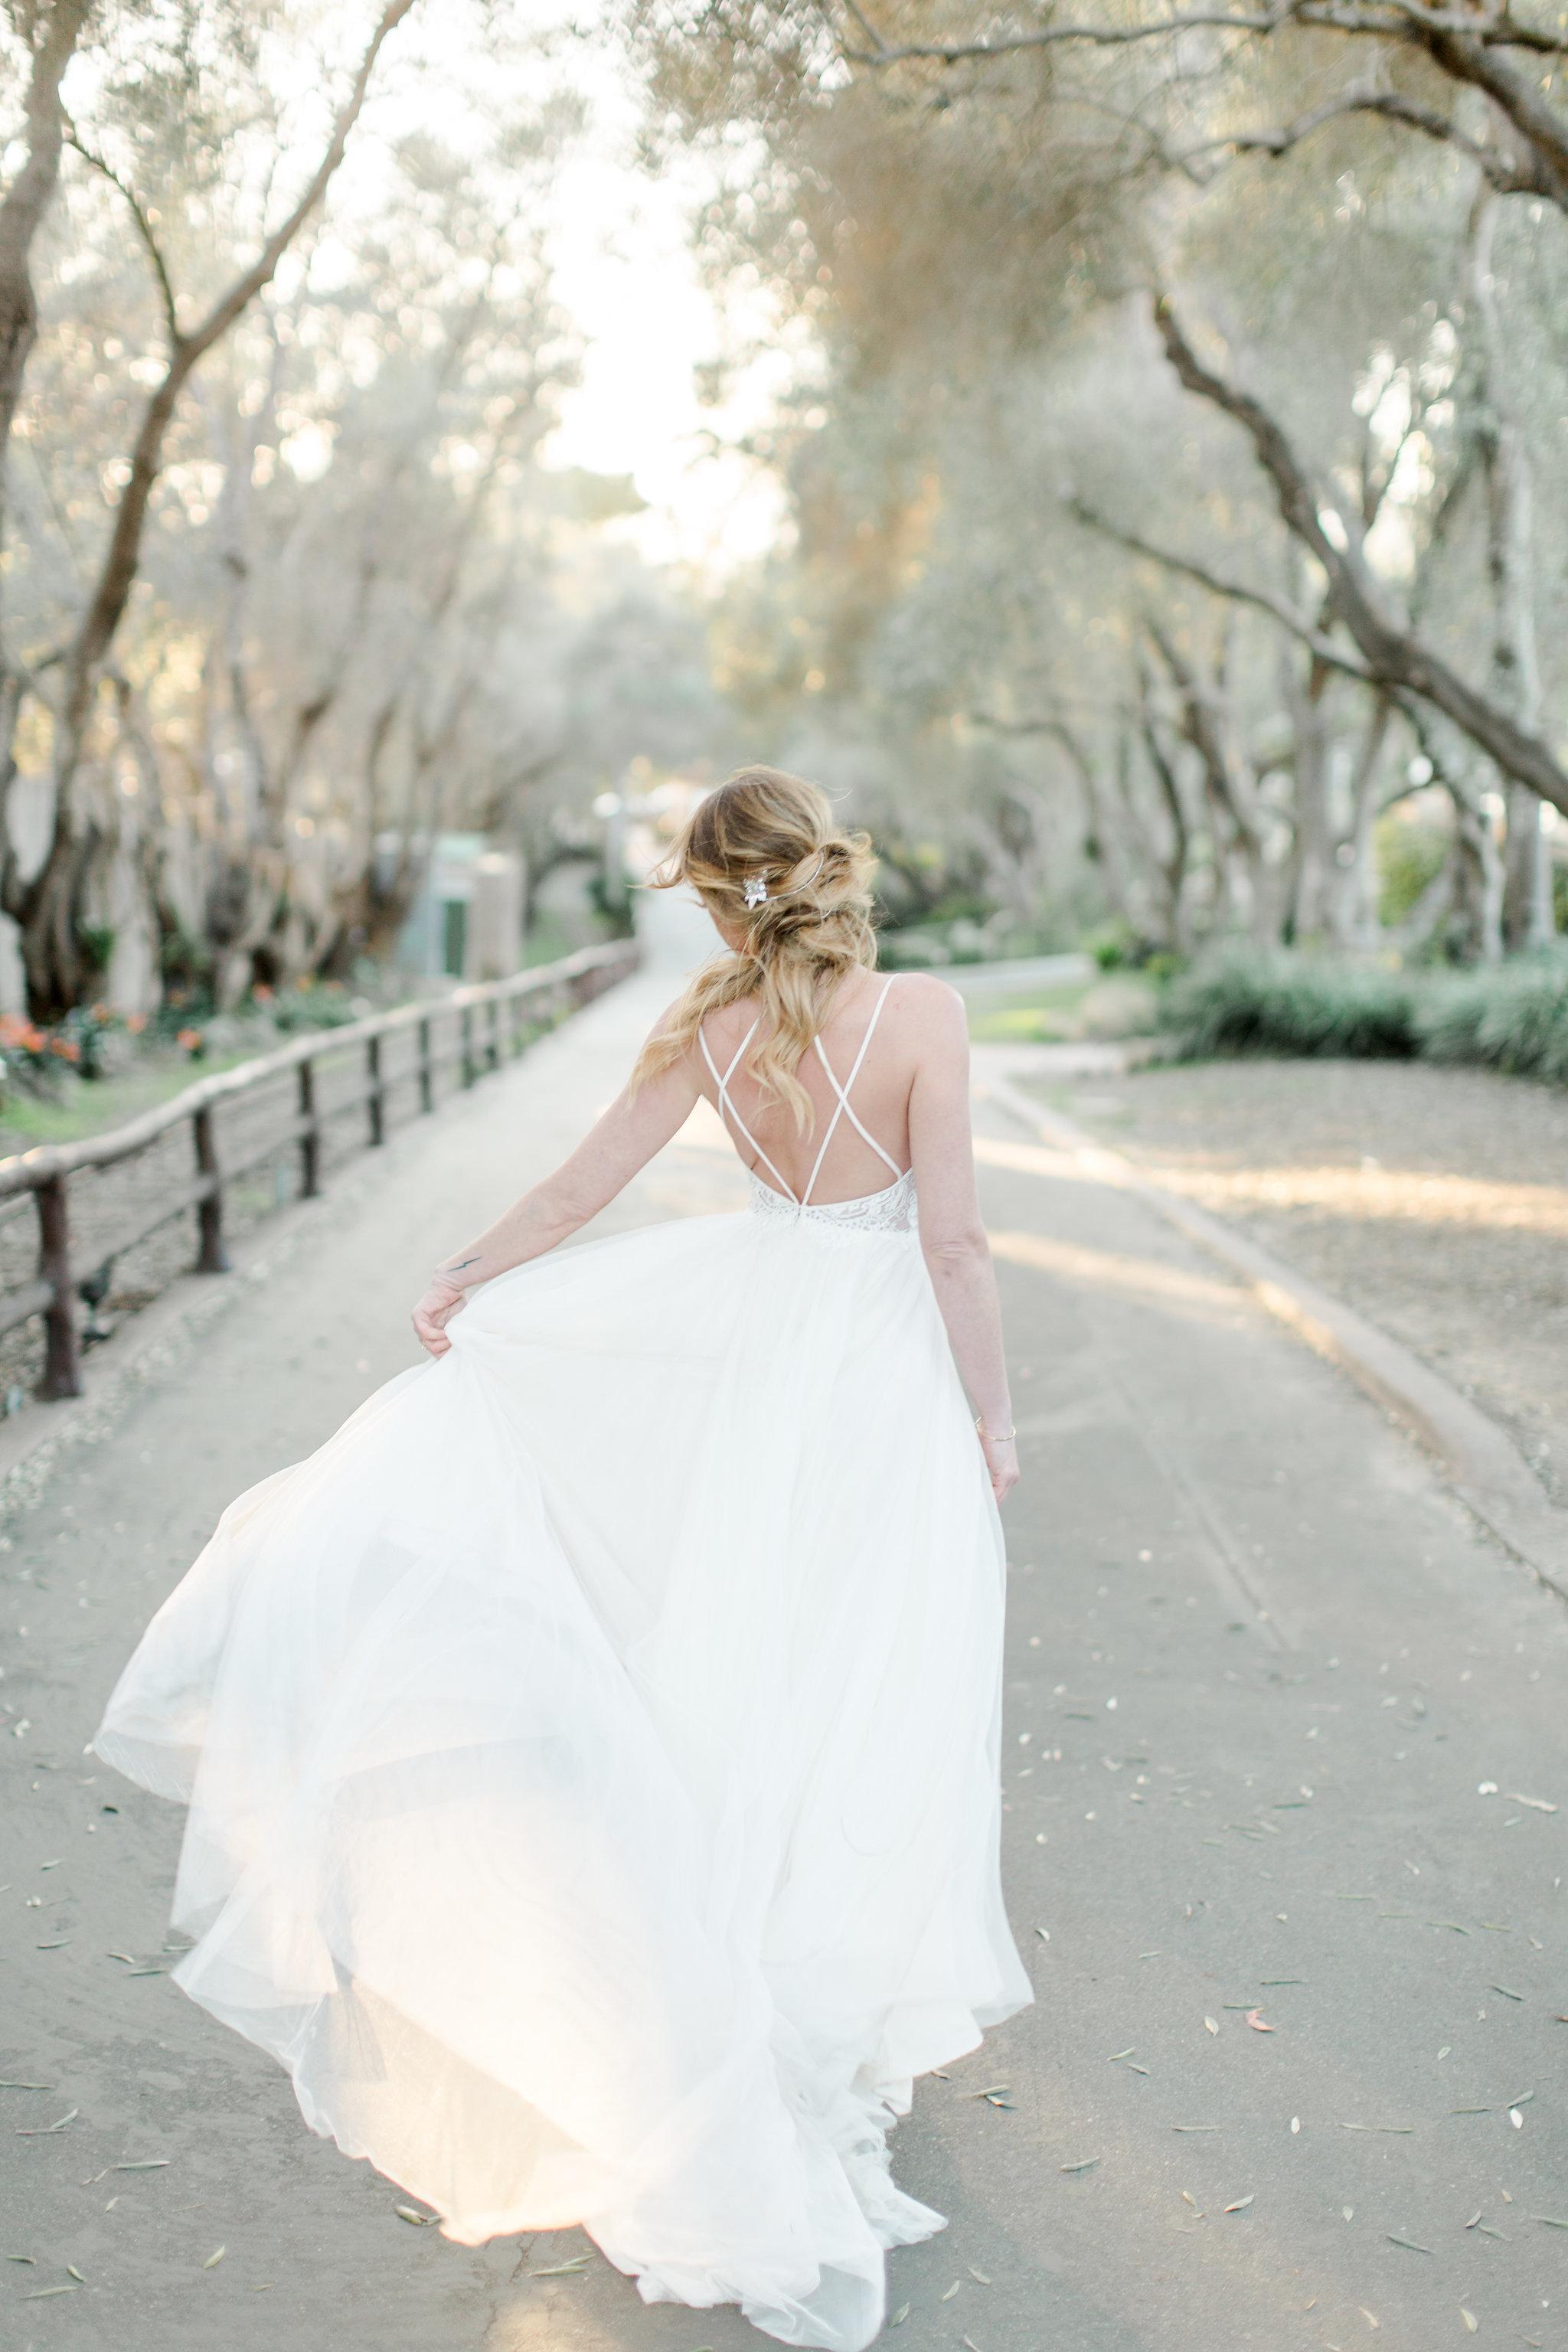 JessieandBryanGilbreath_AngelicaMariePhotography_SantaBarbaraWeddingPhotographer_732.JPG